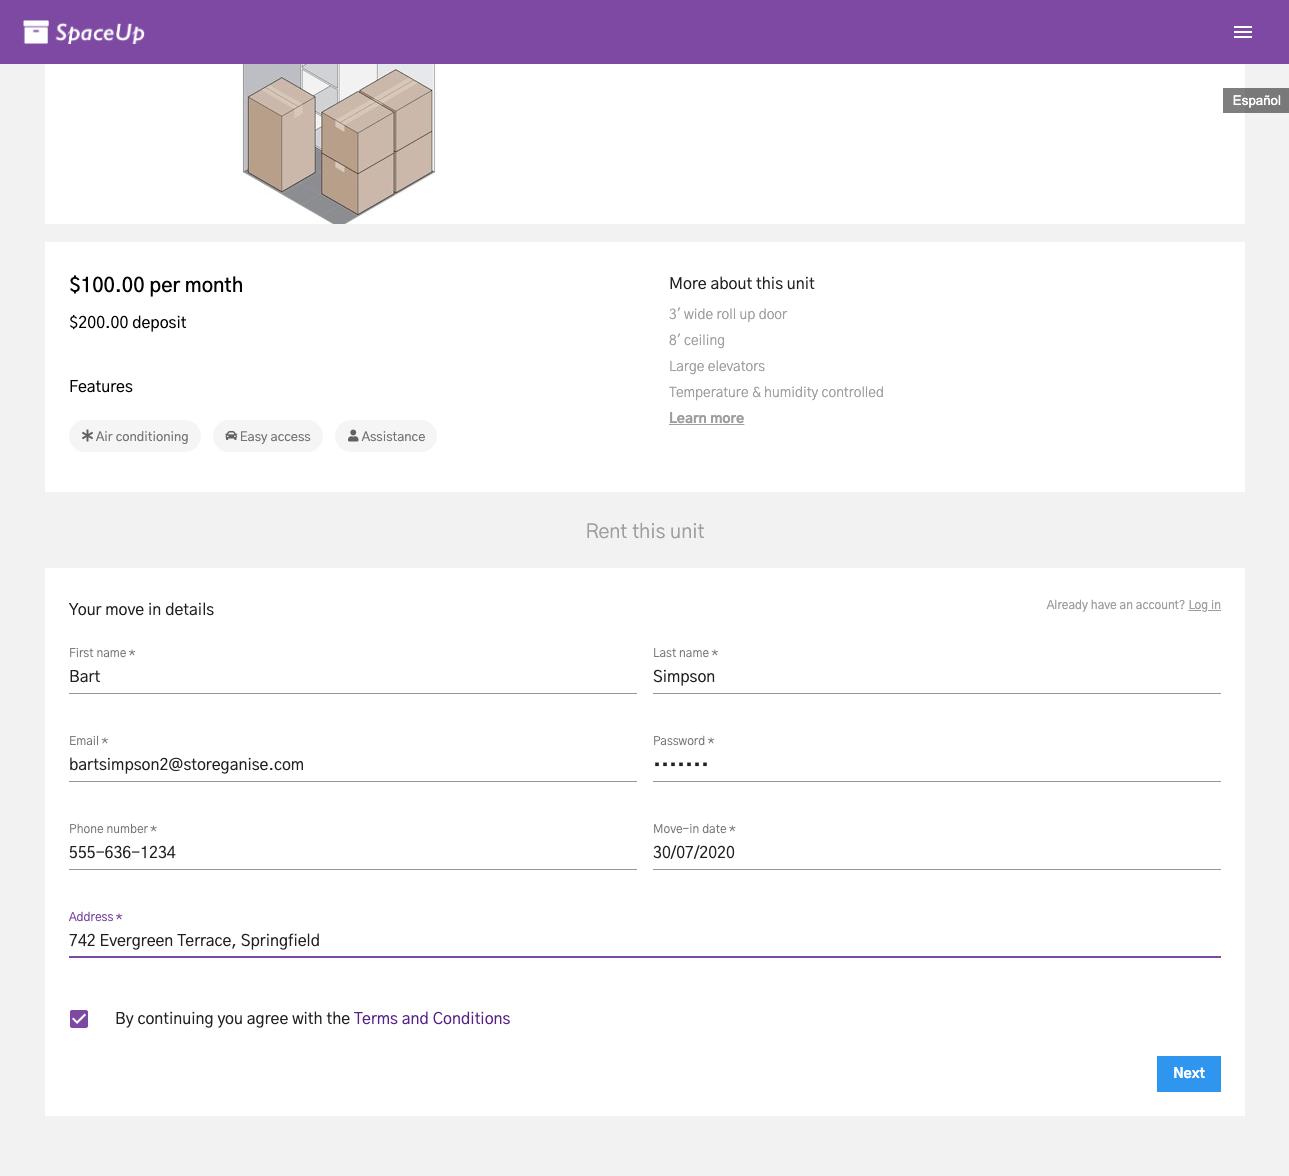 Units Customer App: Customer details & move-in information